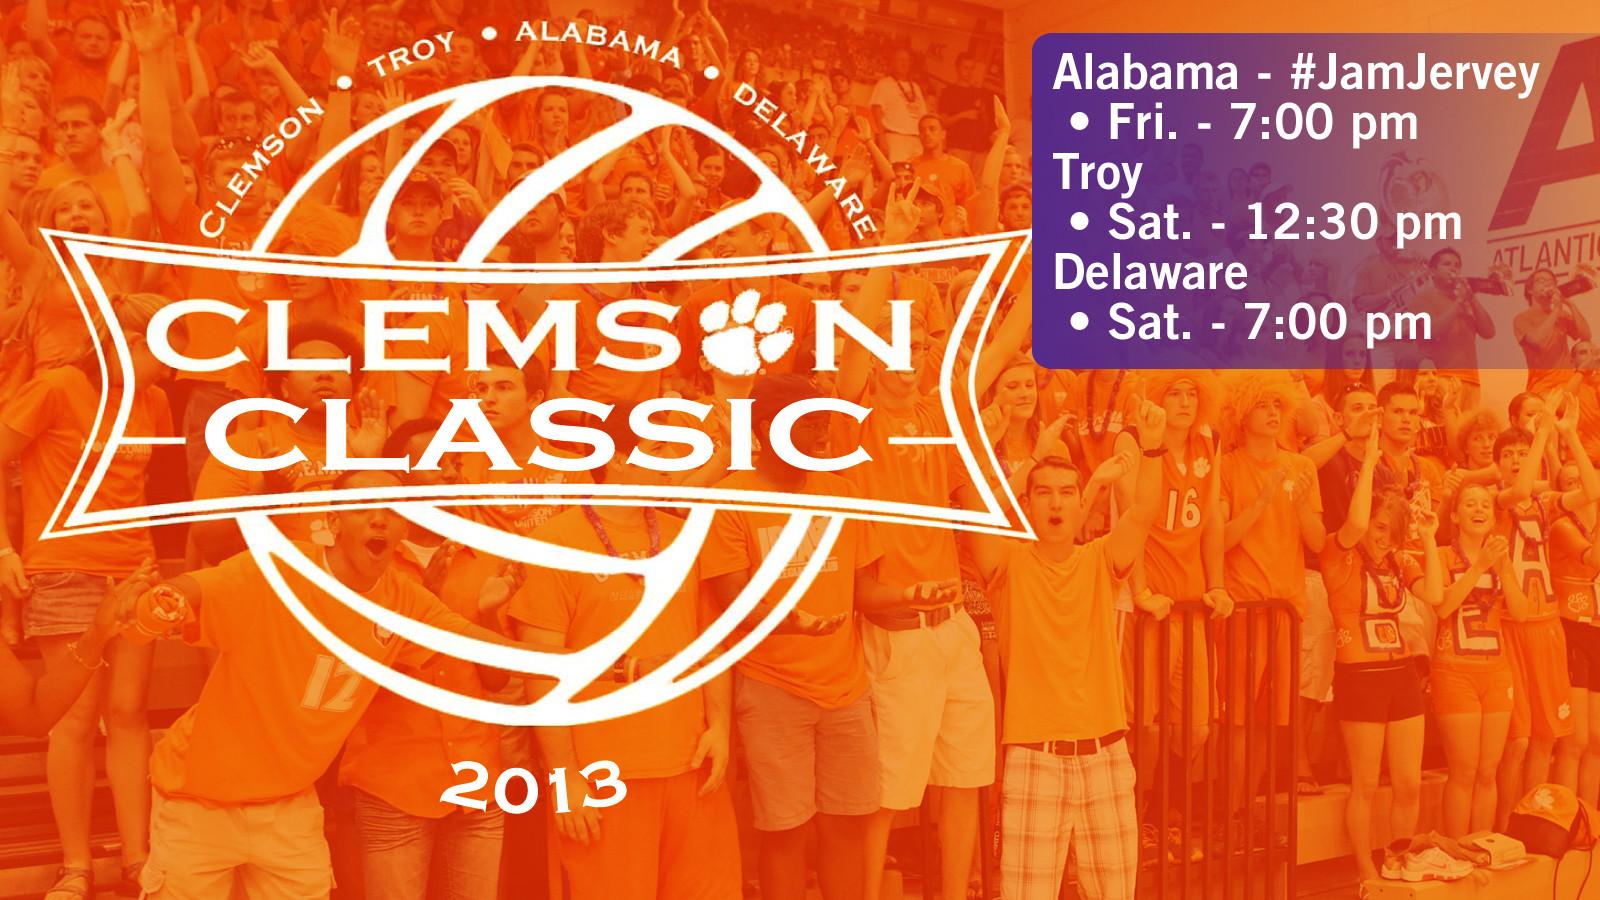 Volleyball (@ClemsonVB) Hosts Clemson Classic This Week